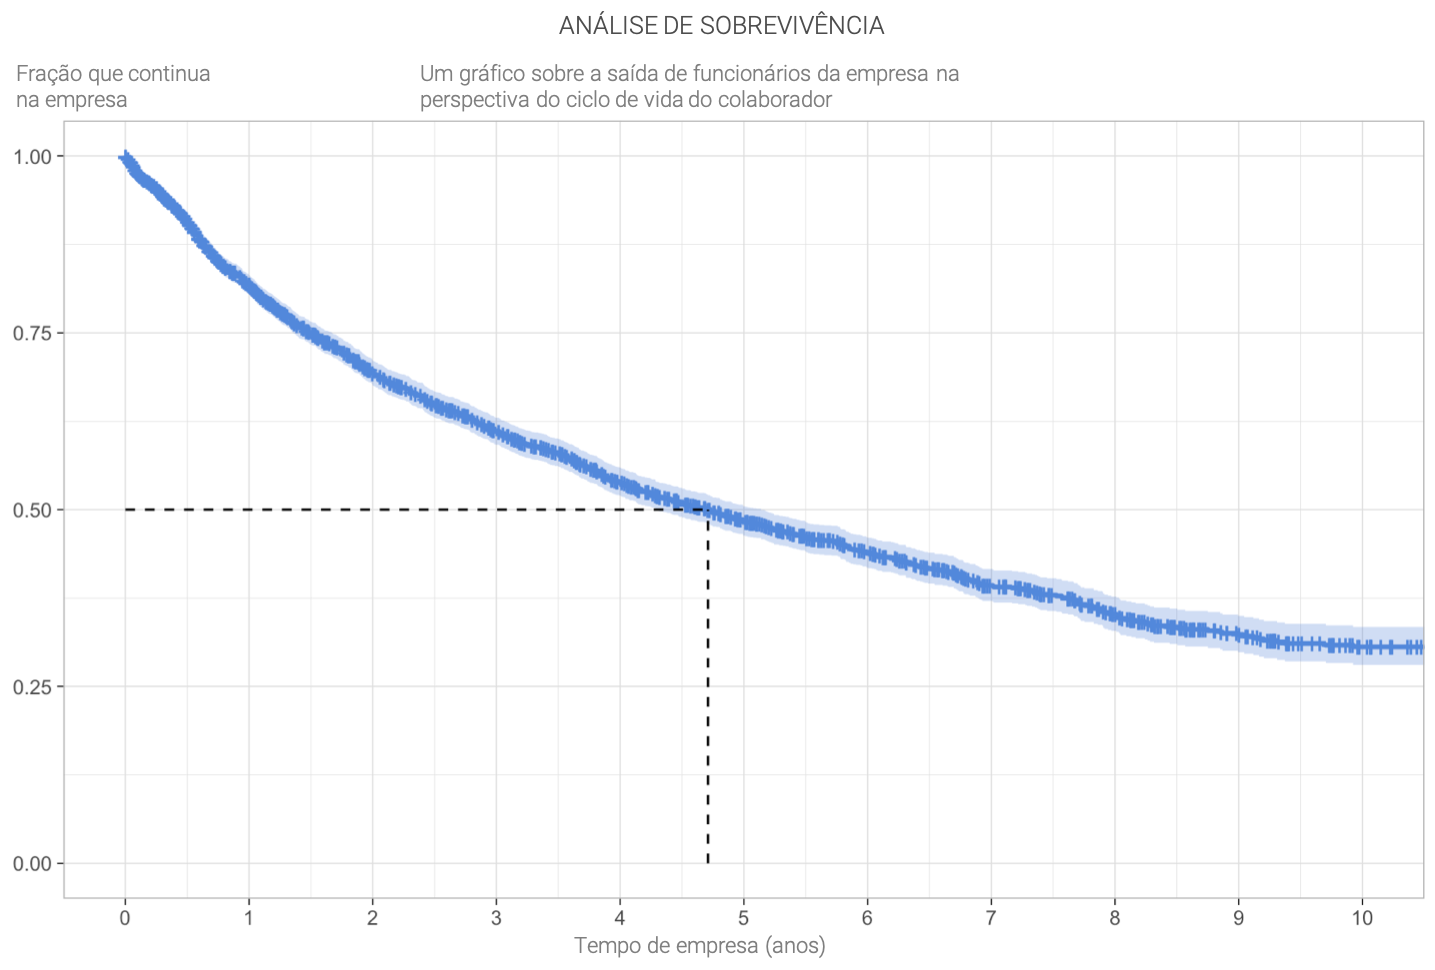 people-analytics-analise-de-sobrevivencia.png